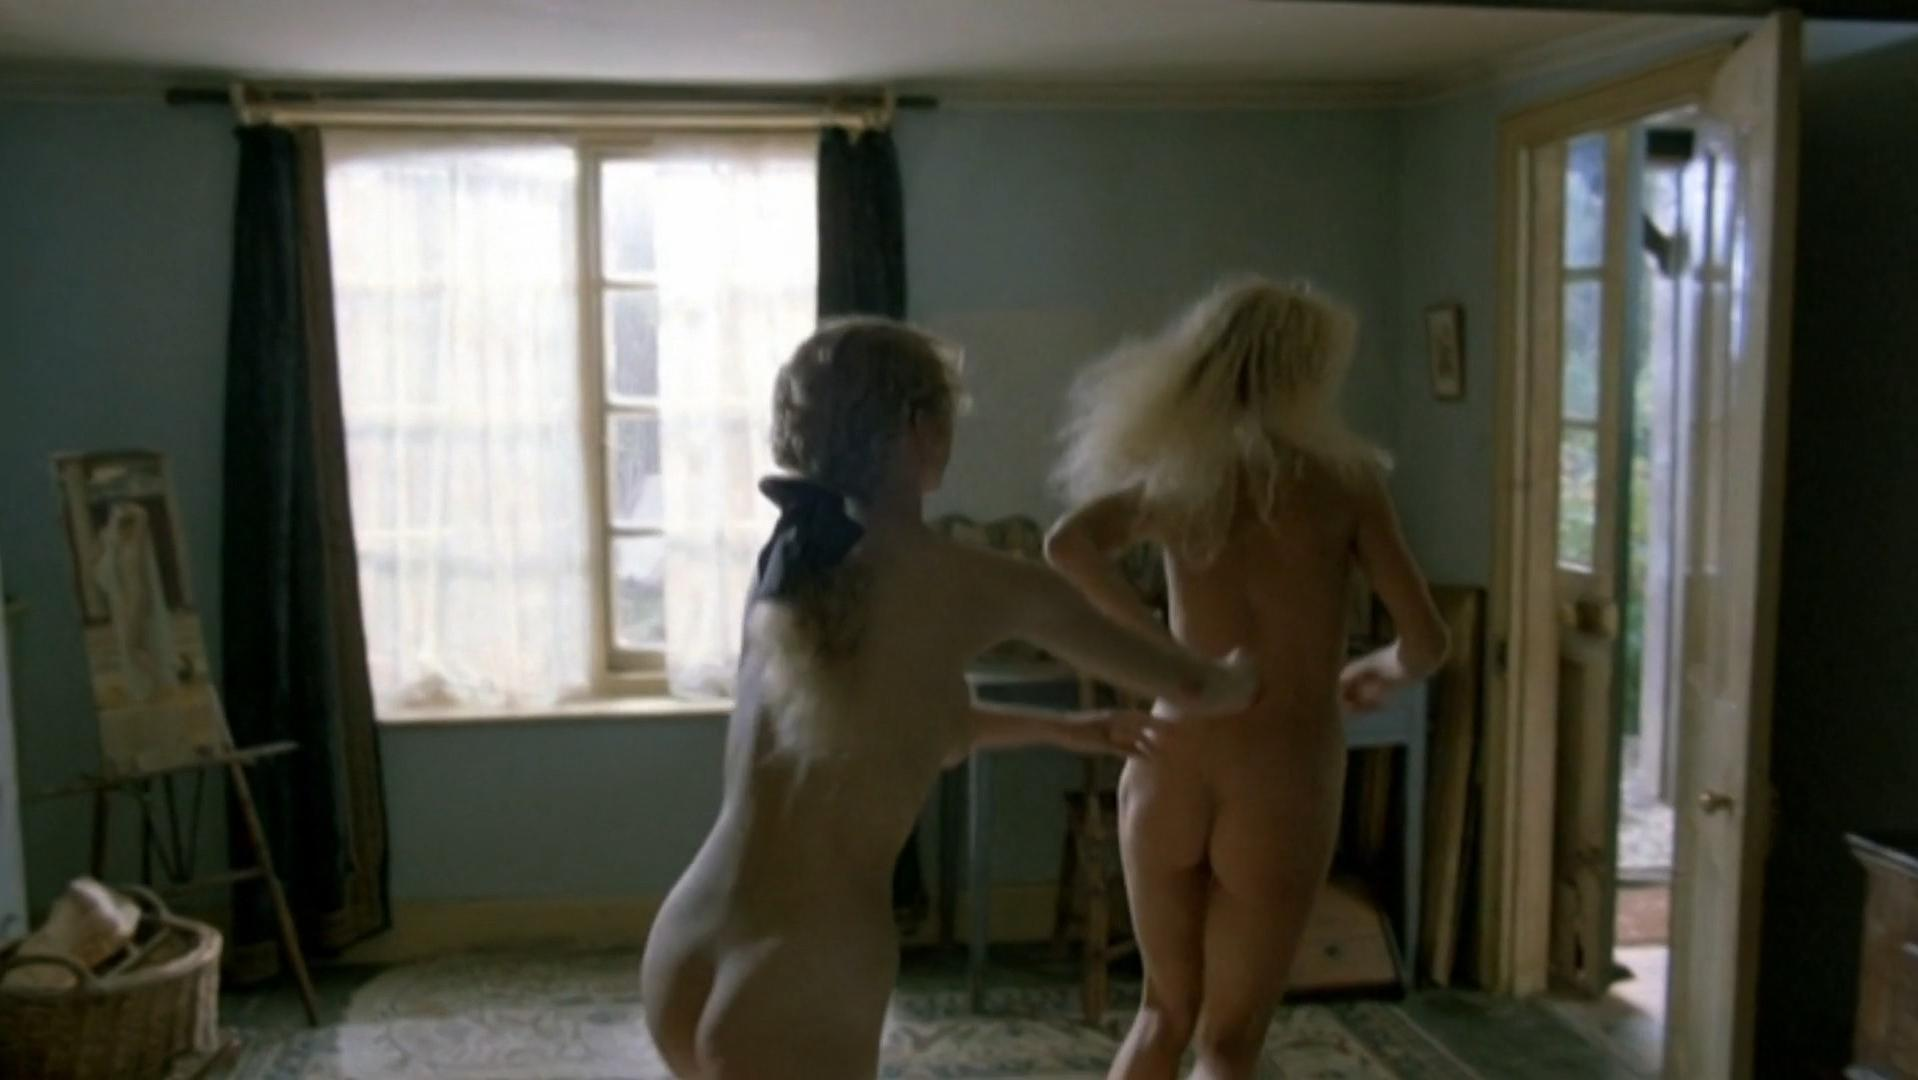 Amanda Donohoe Nude nude video celebs » sammi davis nude, amanda donohoe nude